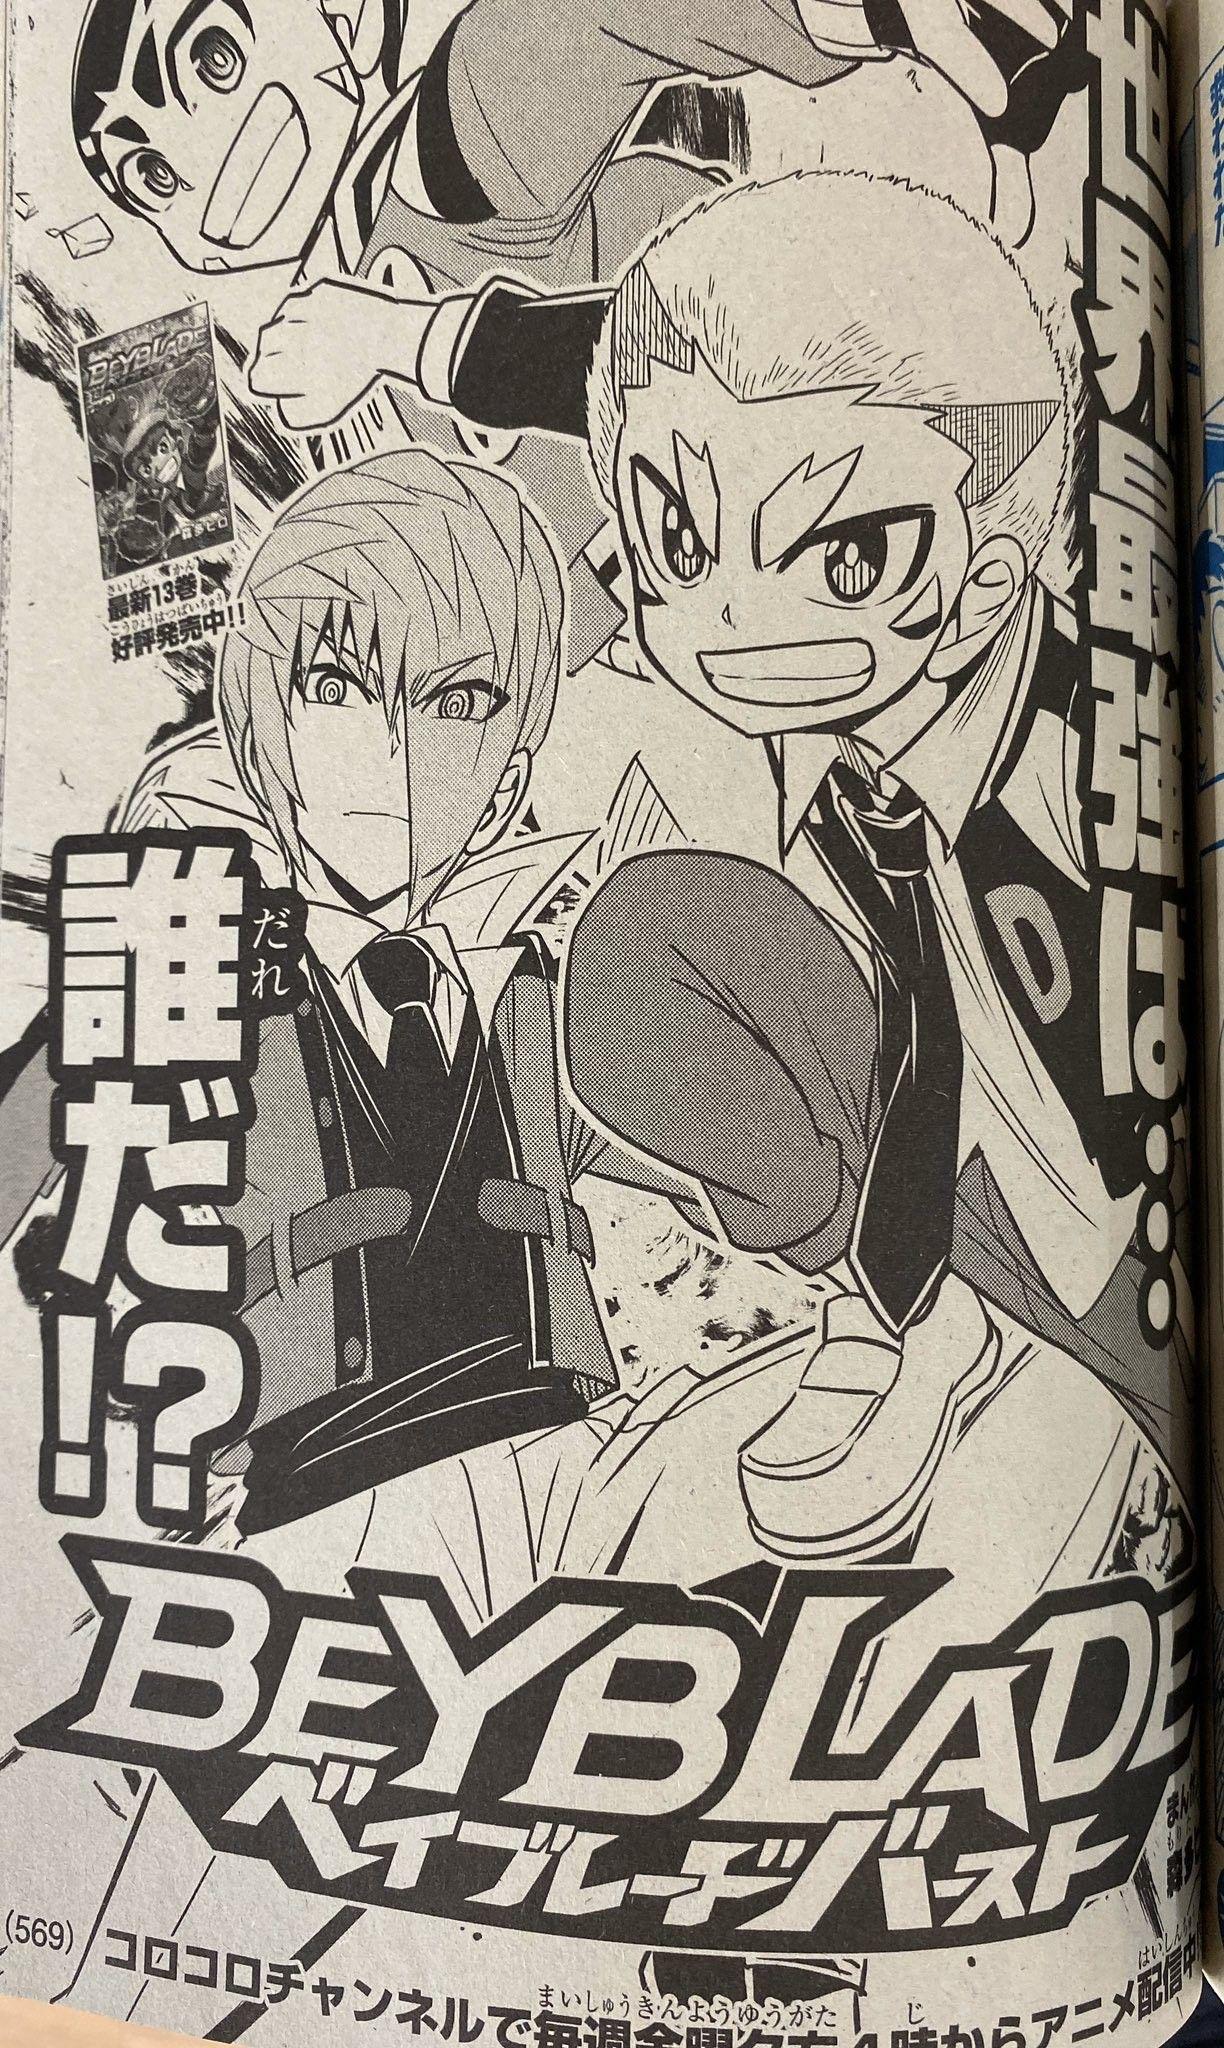 Corocoro Comic November 2019 This Manga Chapter Shows The